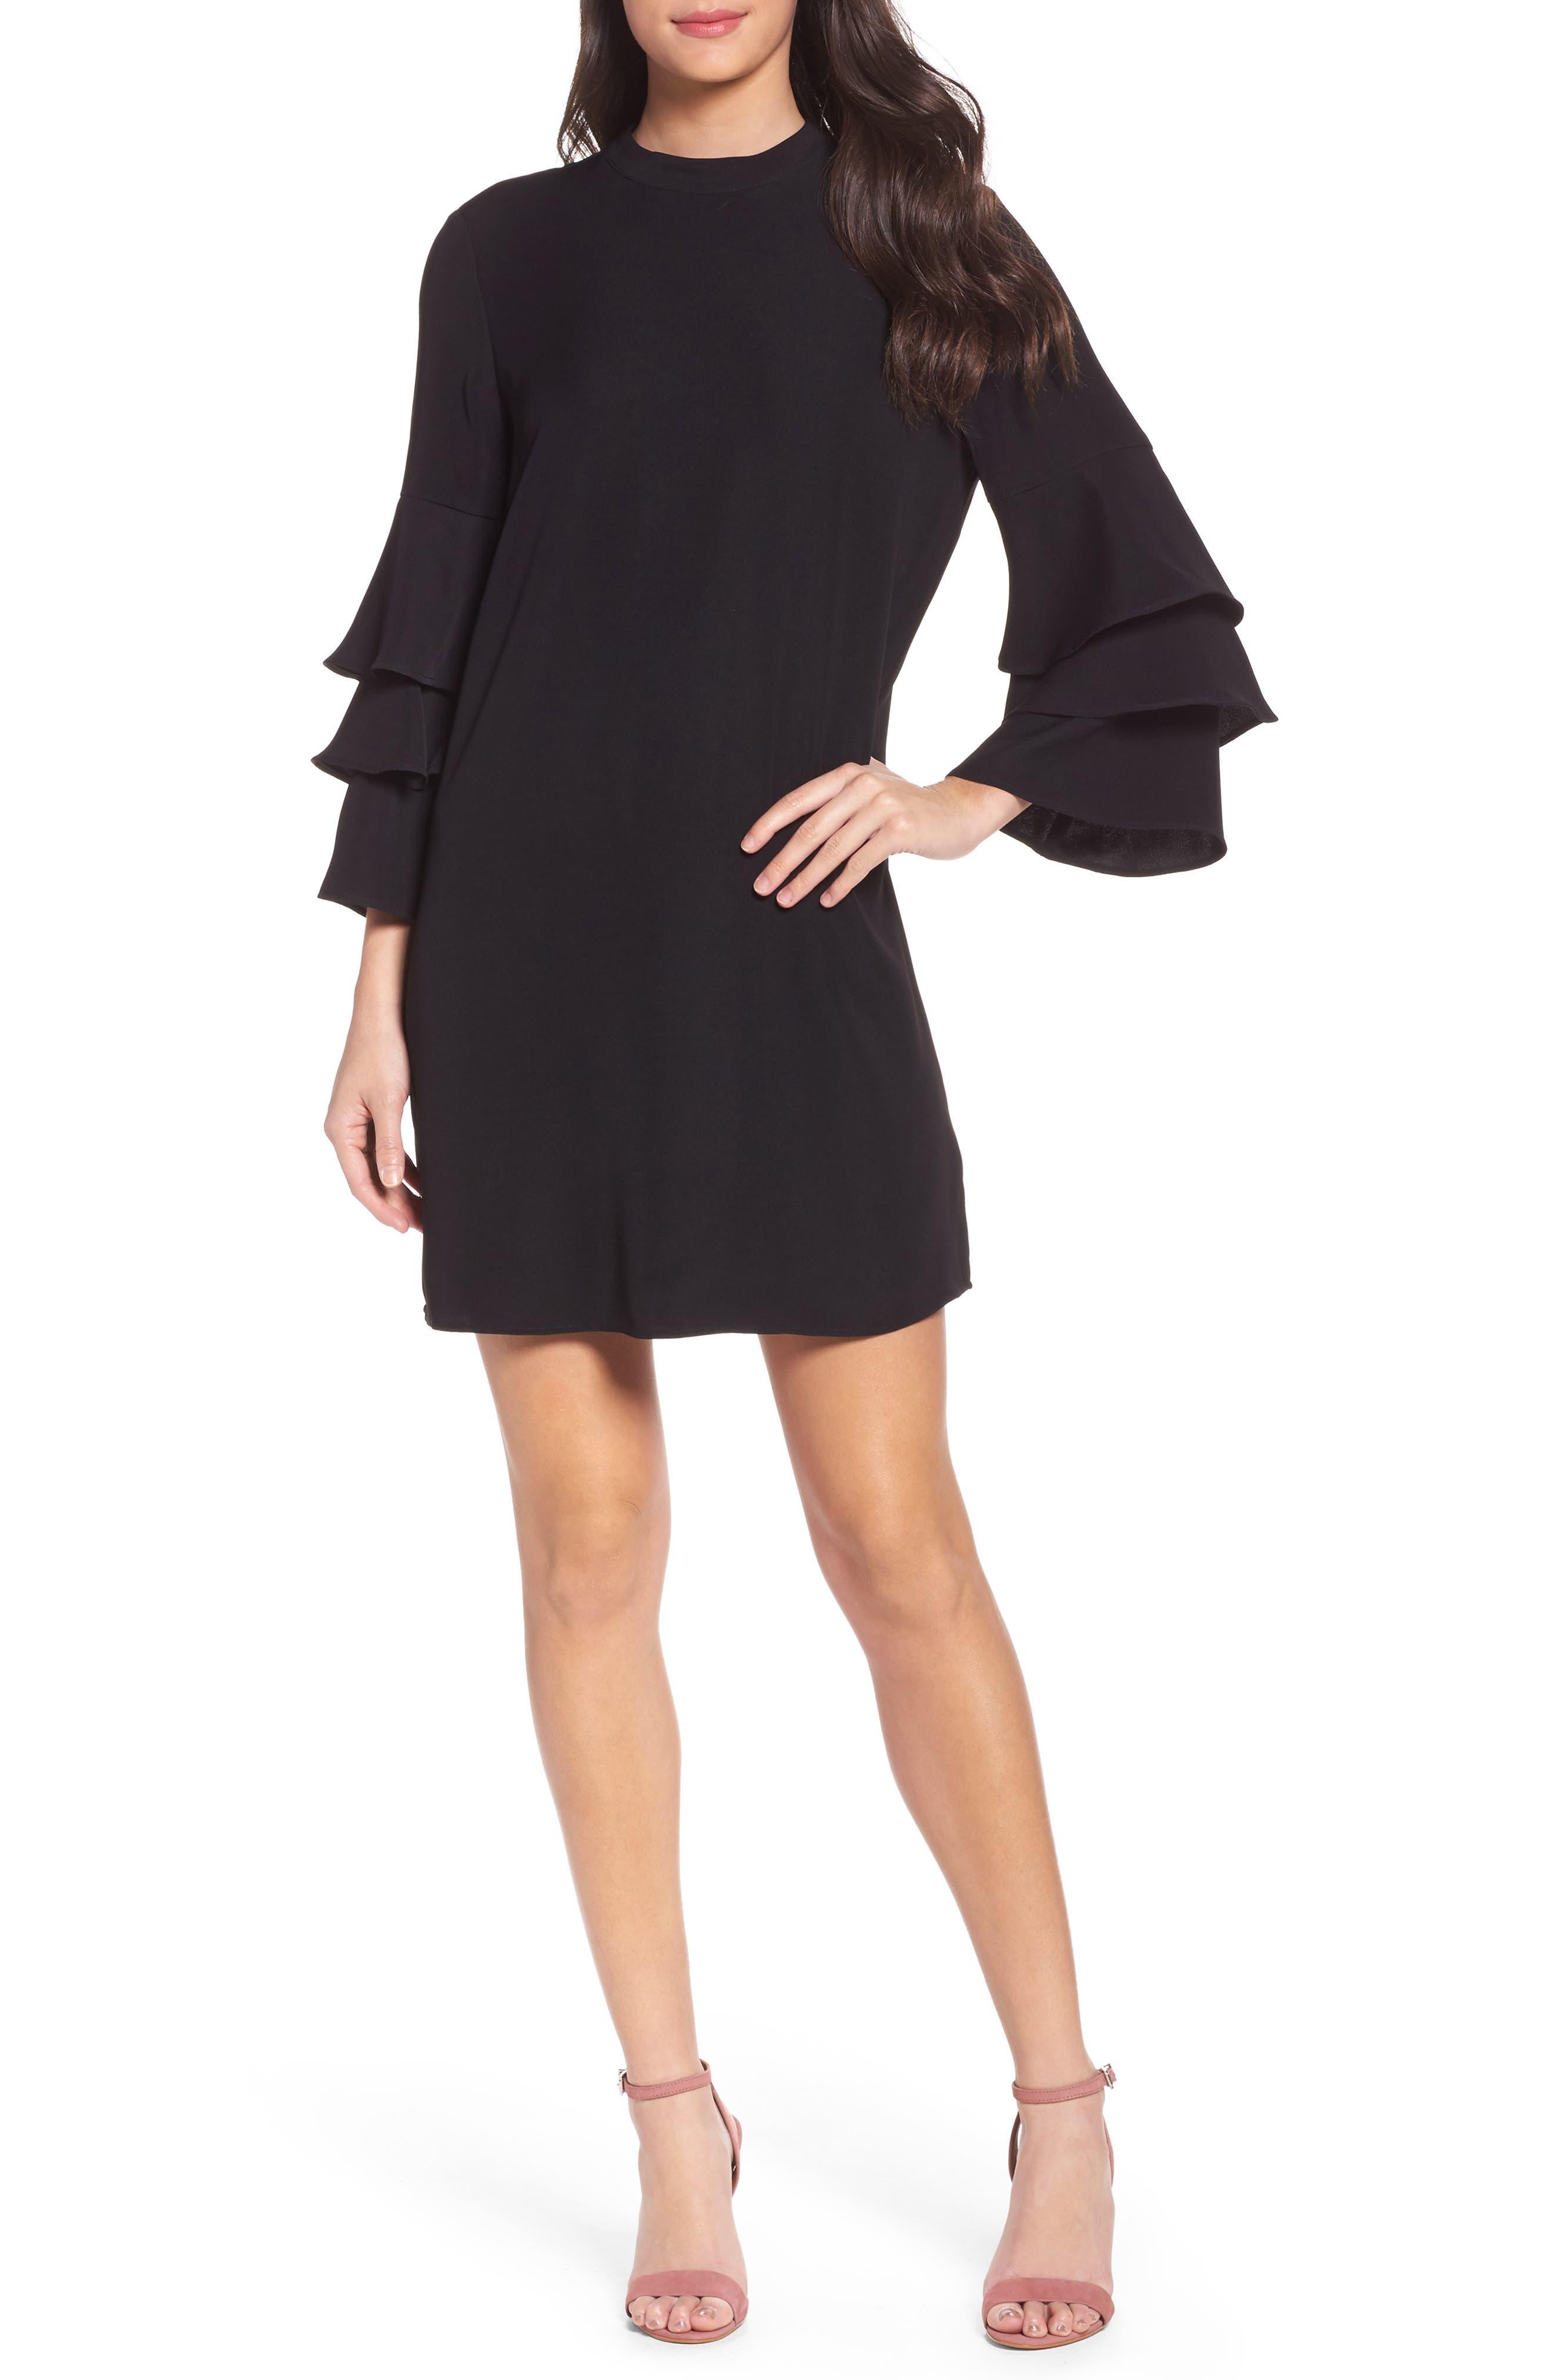 Main Image - Chelsea28 Ruffle Sleeve Shift Dress